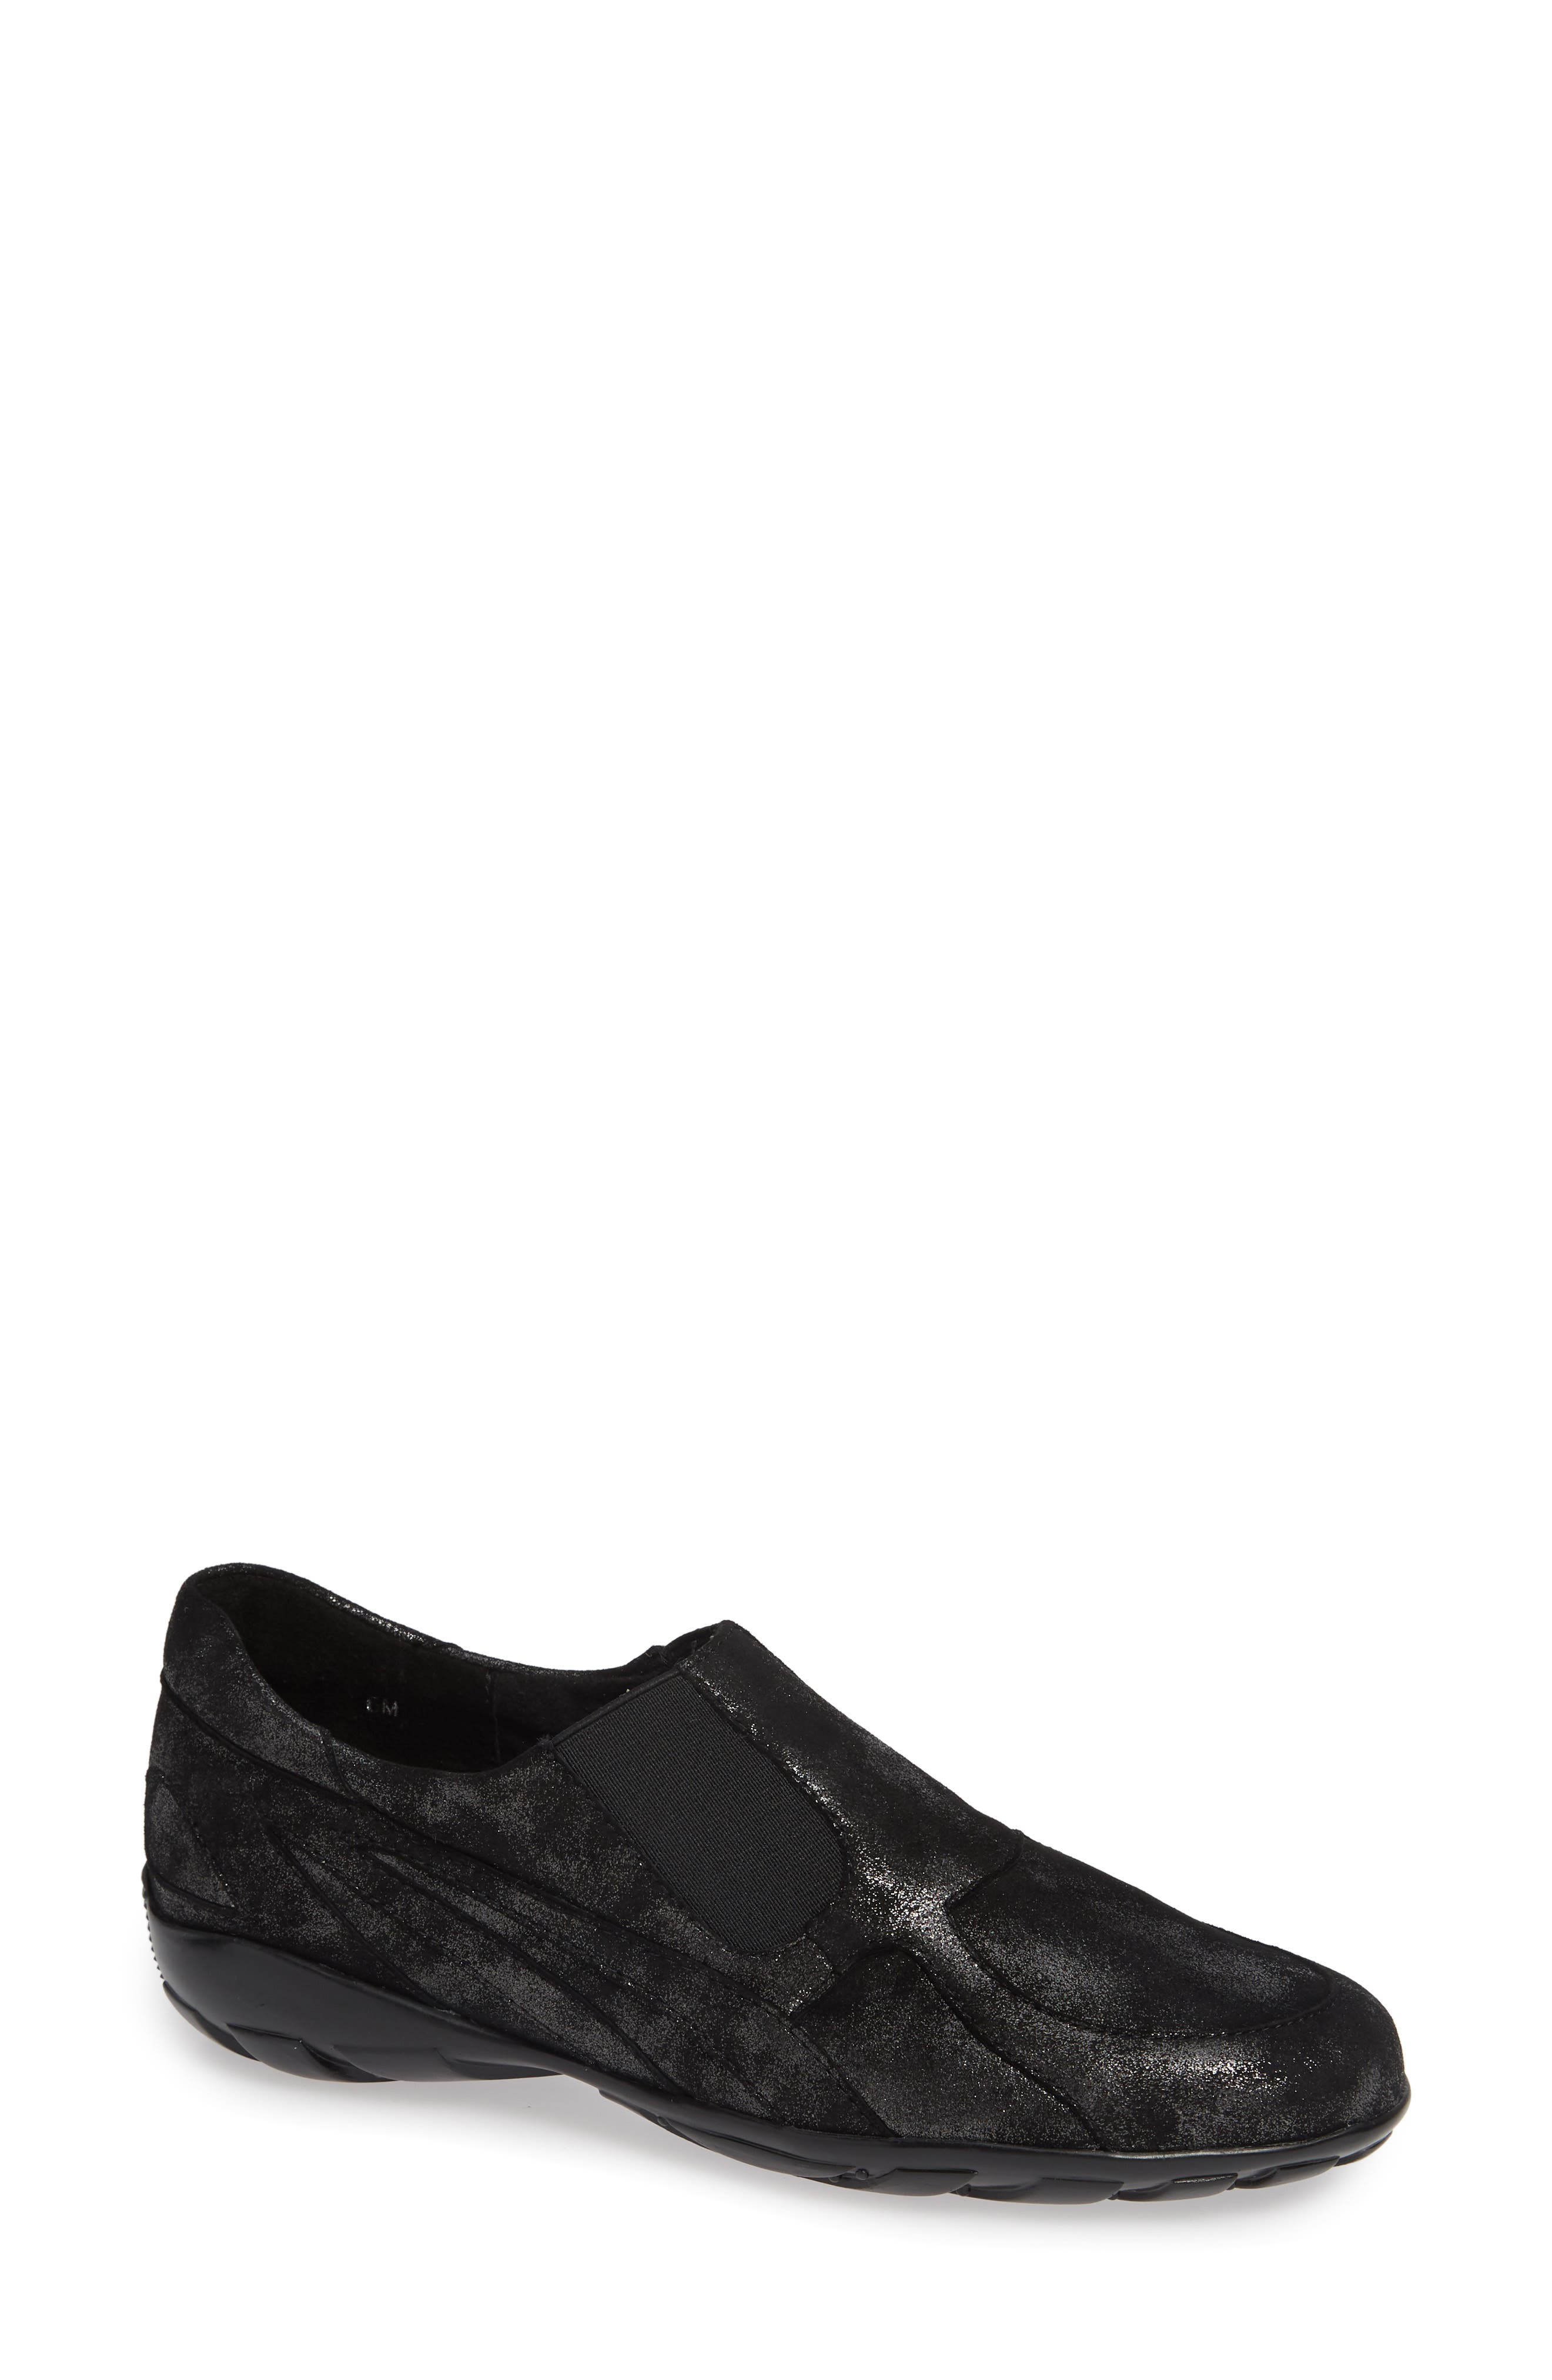 'Attie' Colorblock Slip-On Flat,                         Main,                         color, BLACK